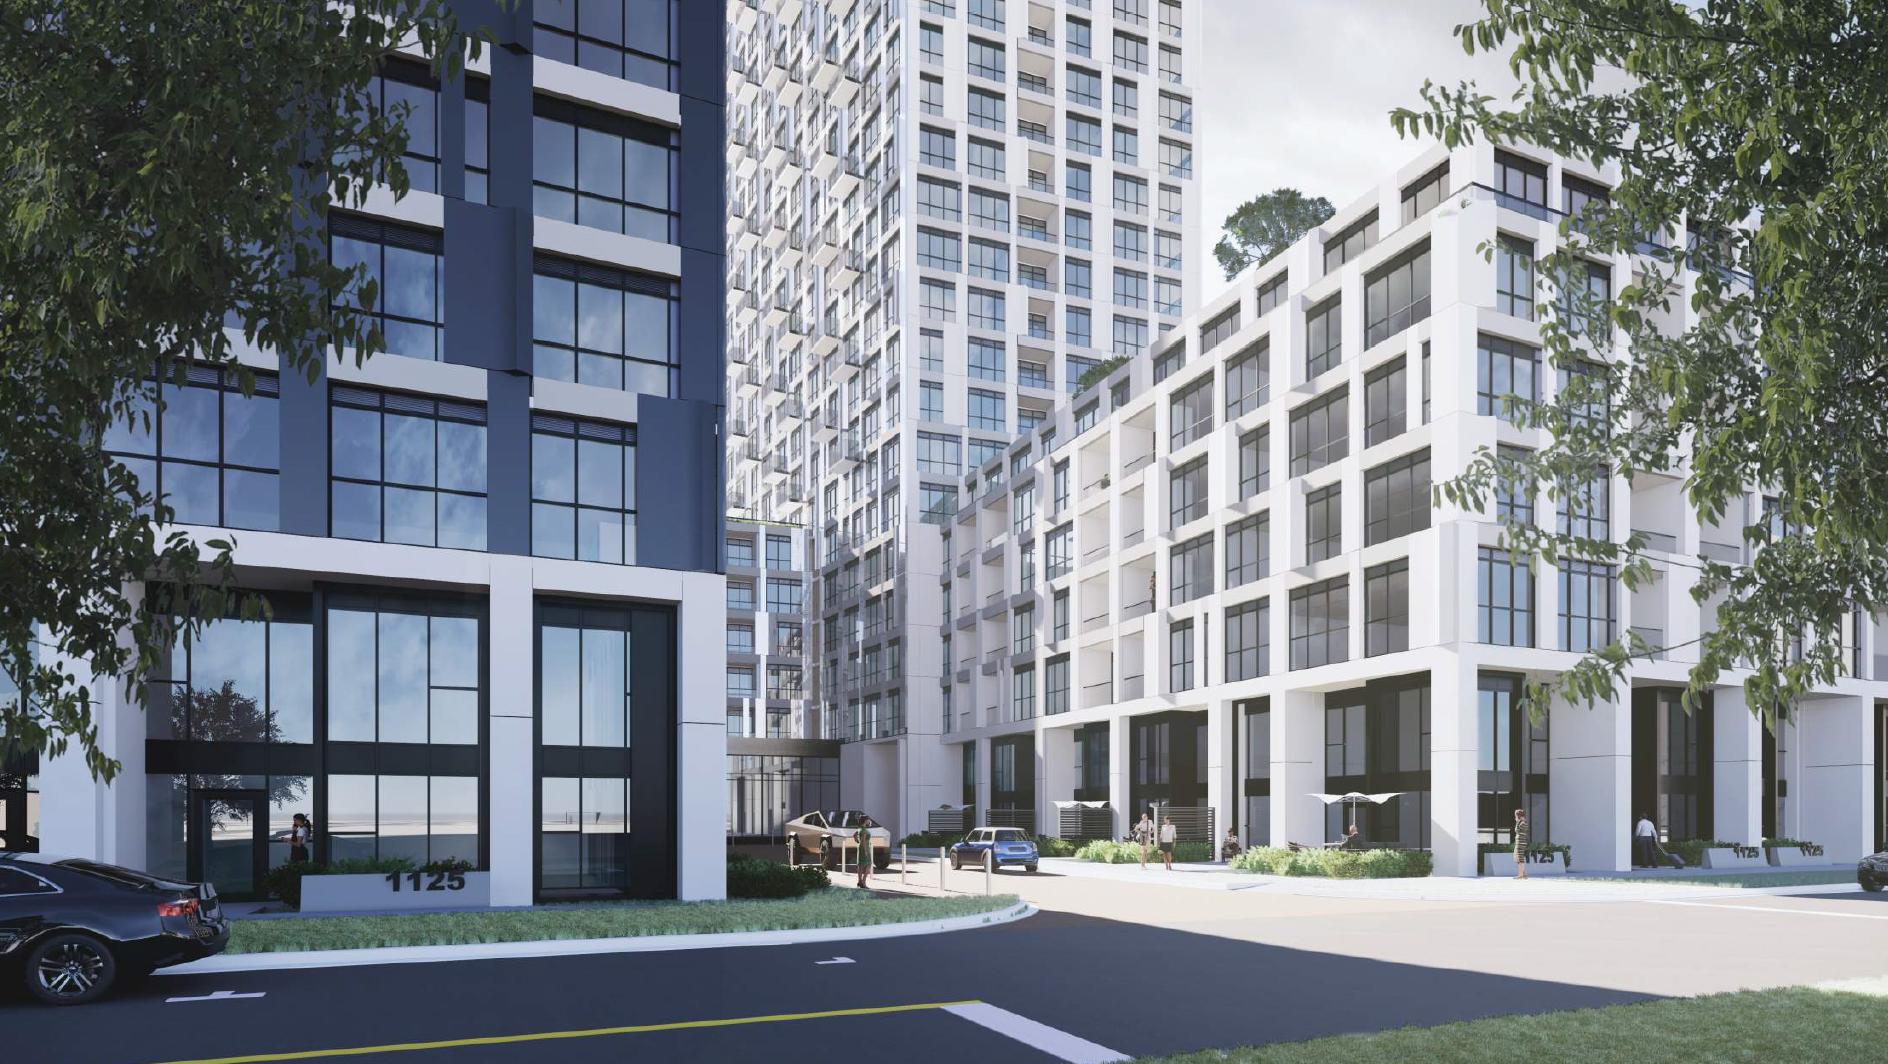 1125 Markham Road, Toronto, designed by Turner Fleischer Architects for Arya Corporation.